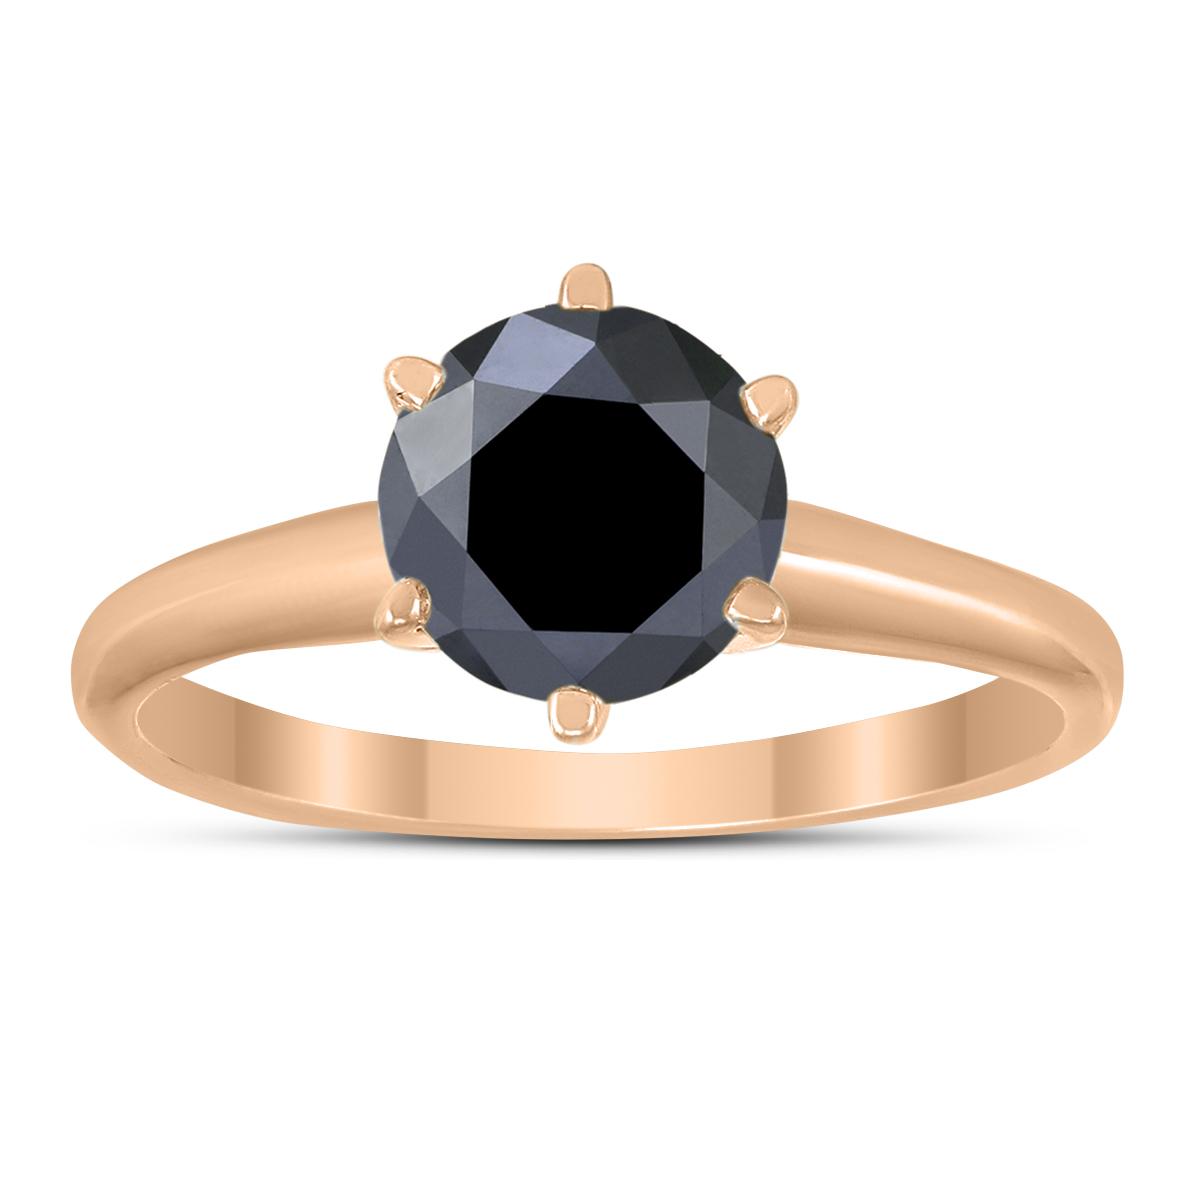 1 1/2 Carat Round Black Diamond Solitaire Ring in 14K Rose Gold